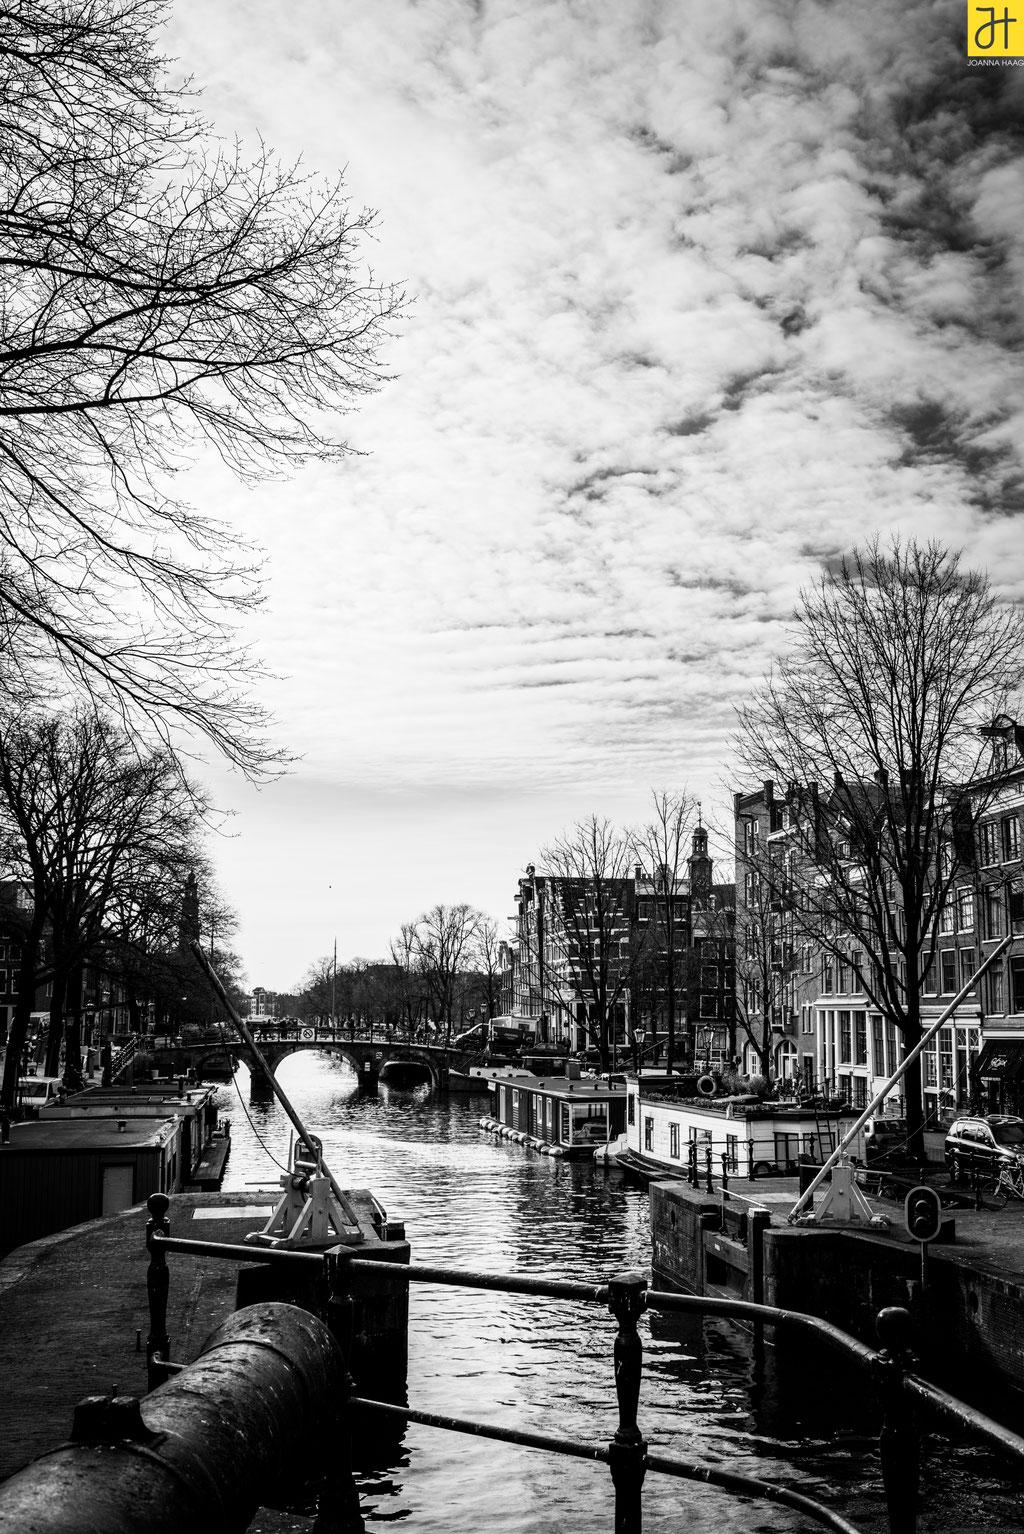 © JOANNA HAAG - Amsterdam 02/2019